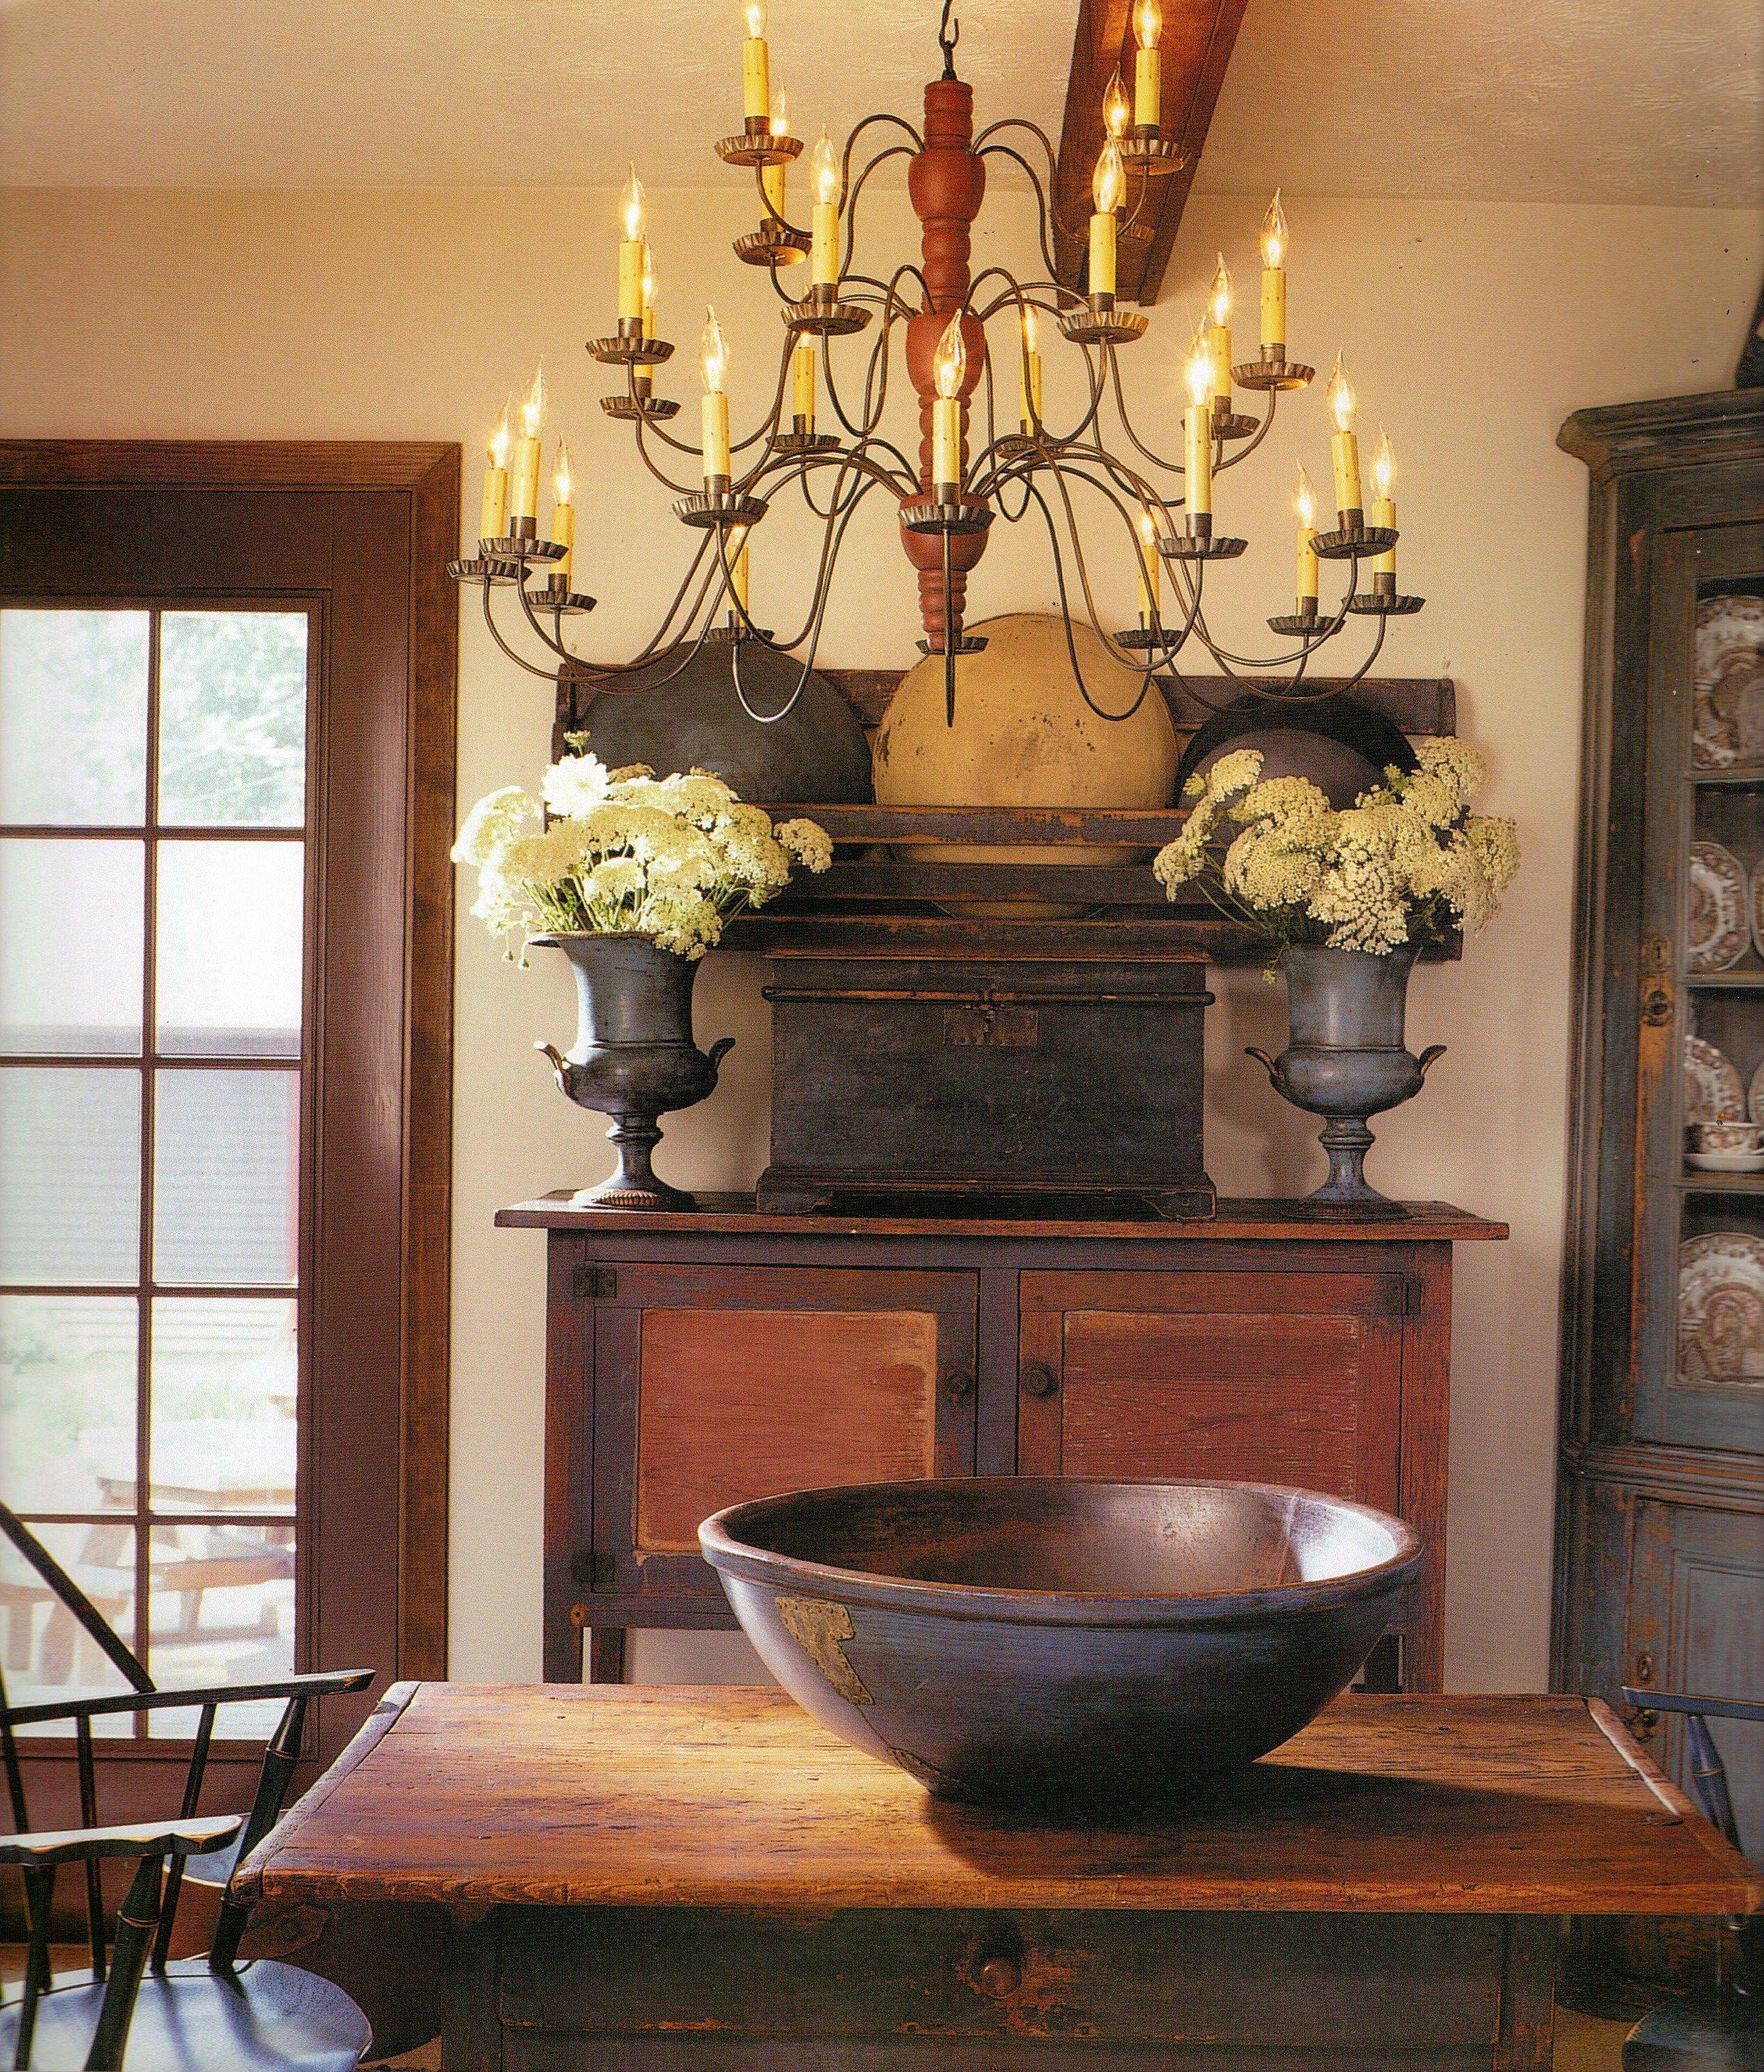 Primitive Dining Room Furniture: Linda Broughman Via Hamilton House Onto Primitives